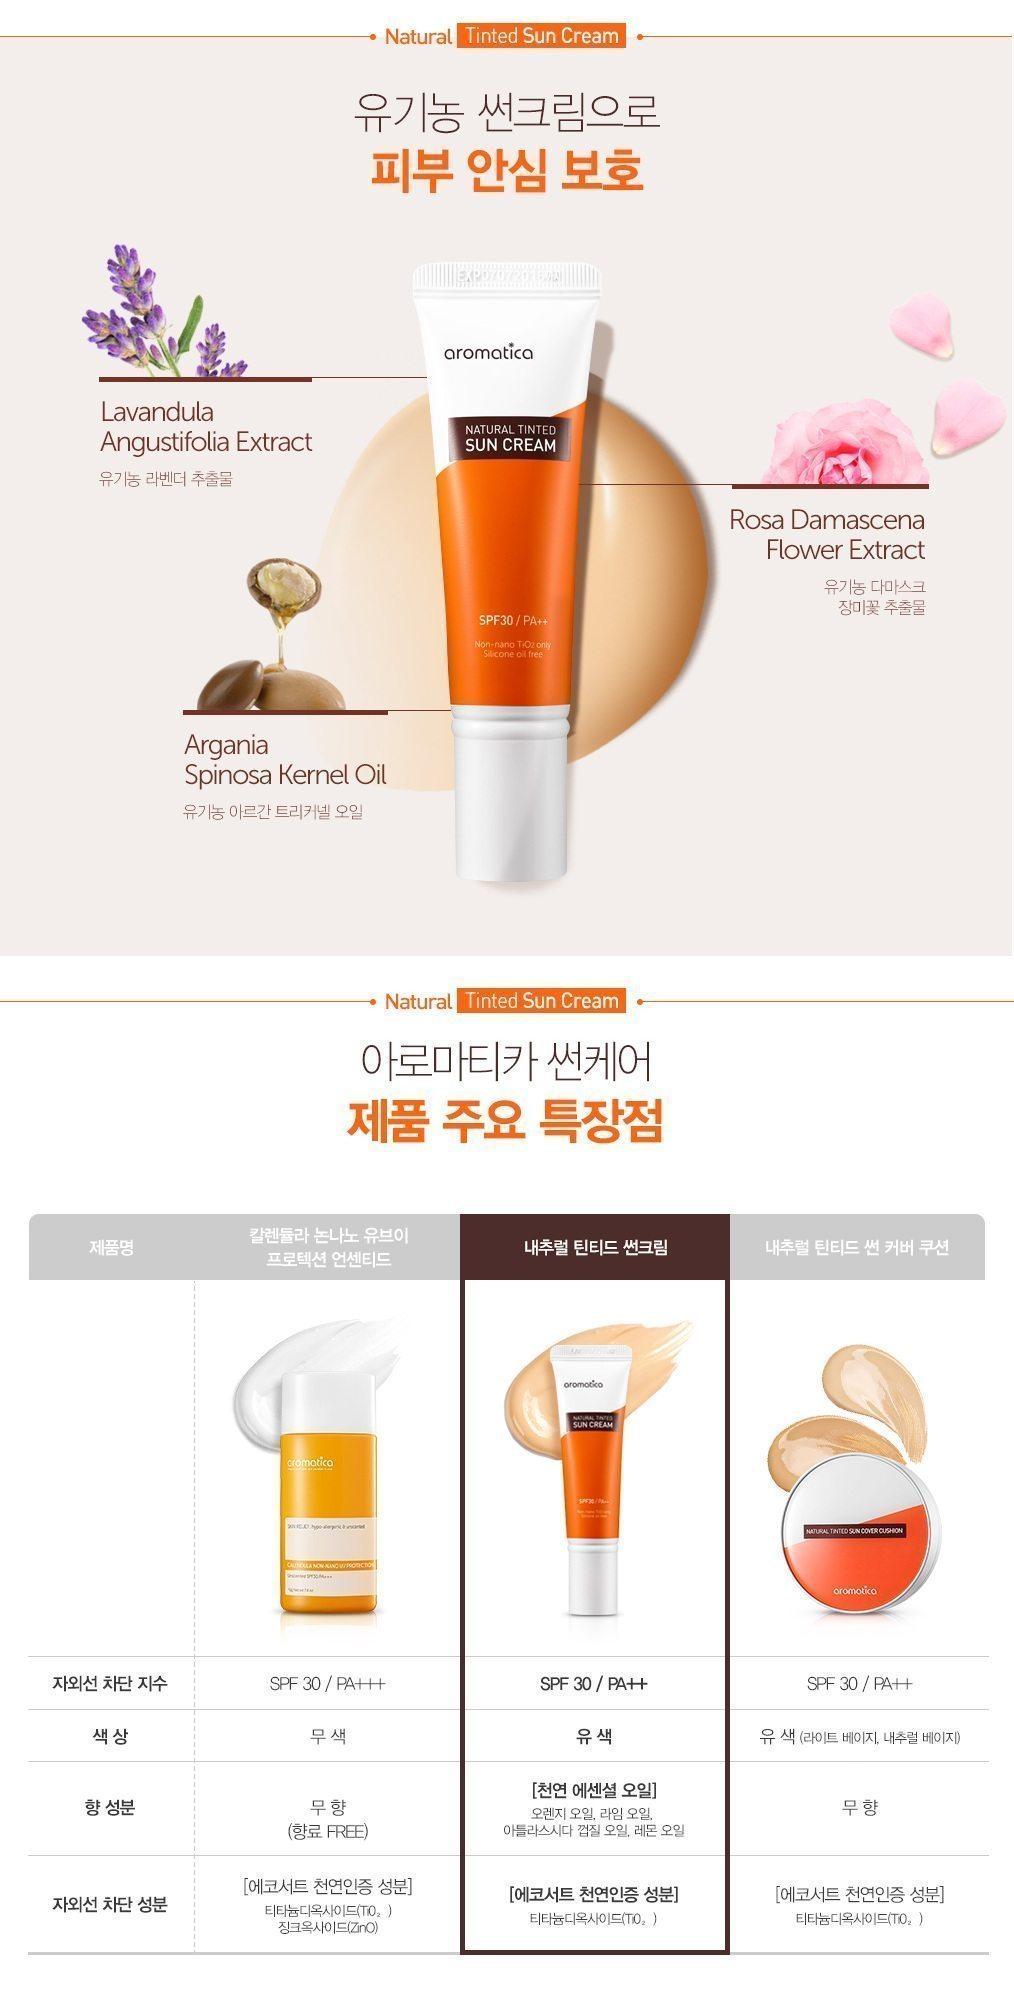 Aromatica Natural Tinted Sun Cream korean cosmetic skincare product online shop malaysia china japan5